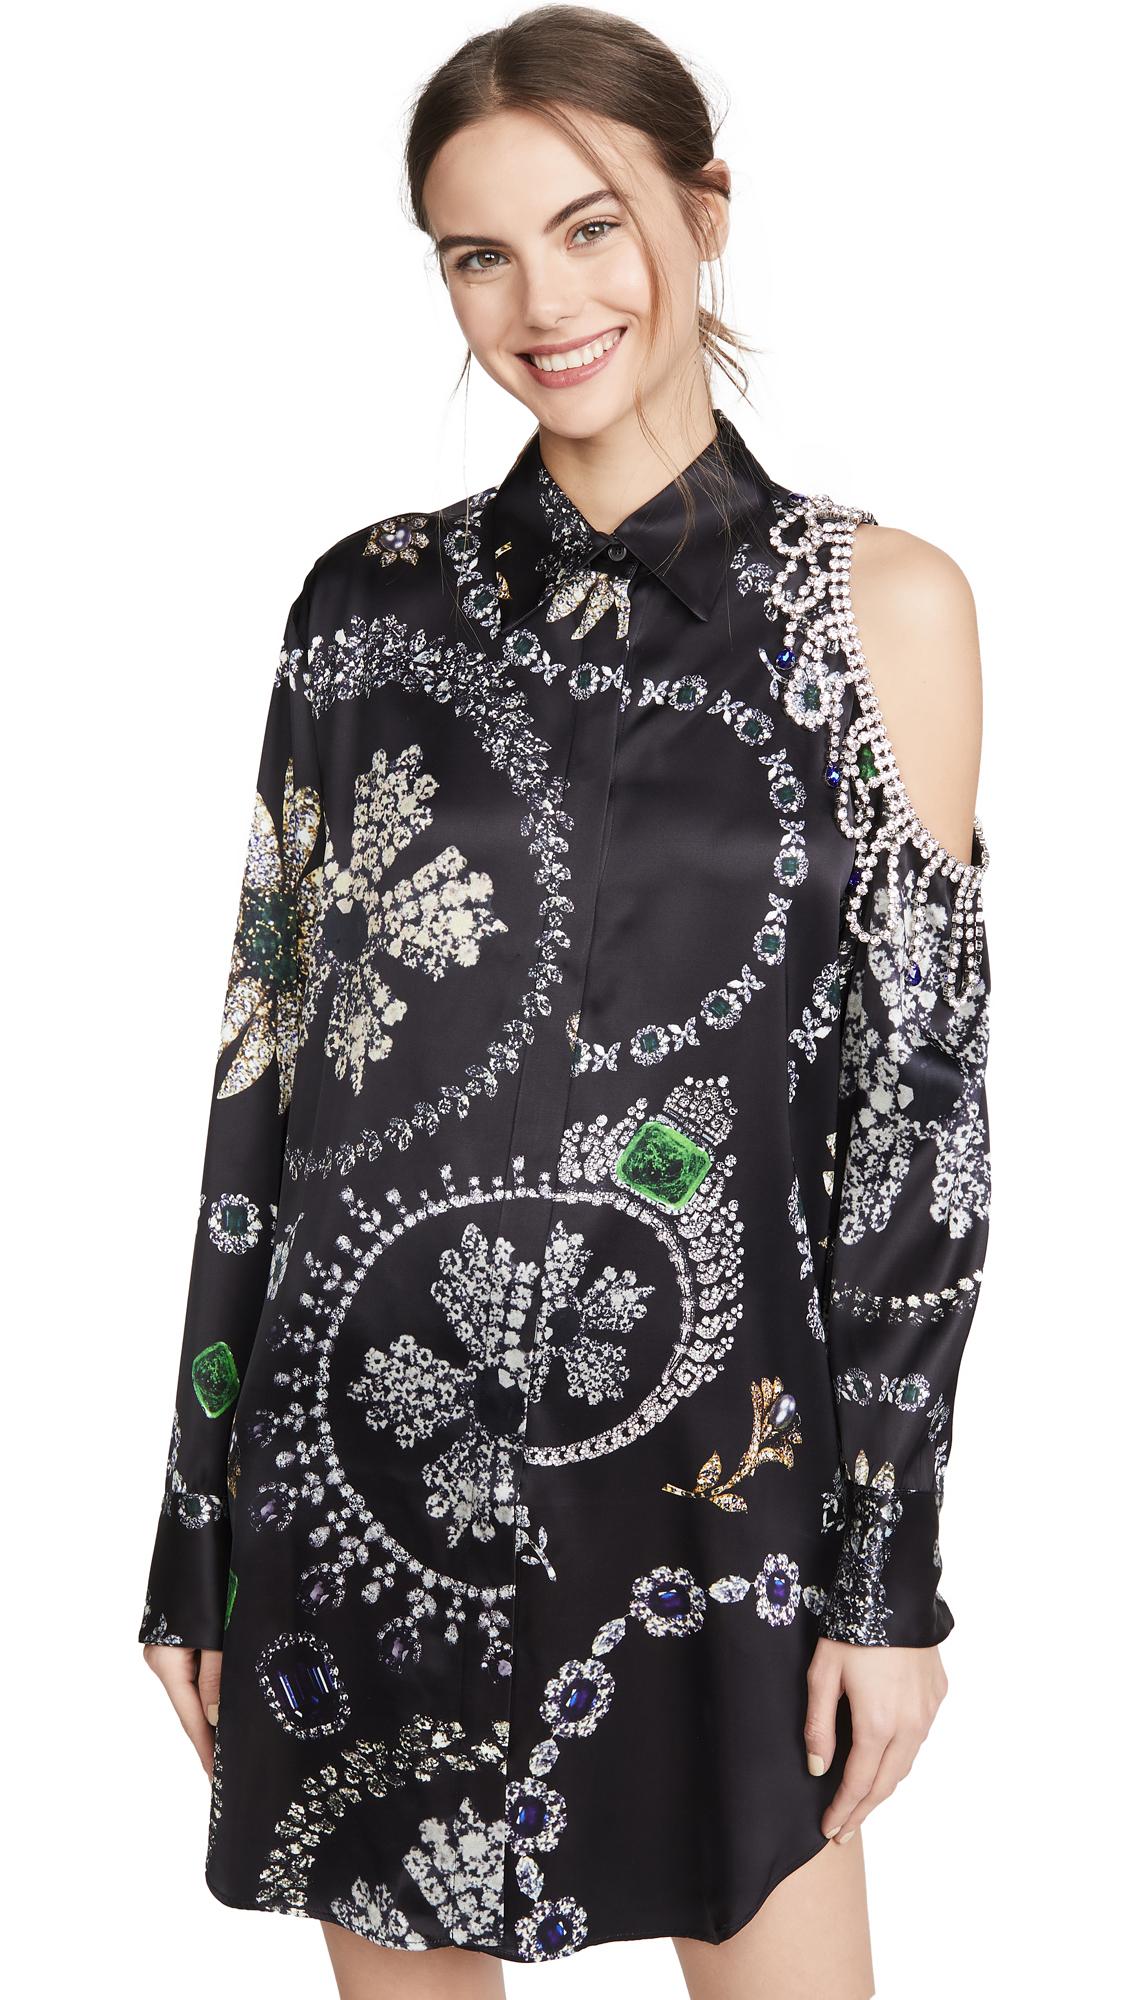 Area Jewelry Print Crystal Cutout Shirtdress - 50% Off Sale